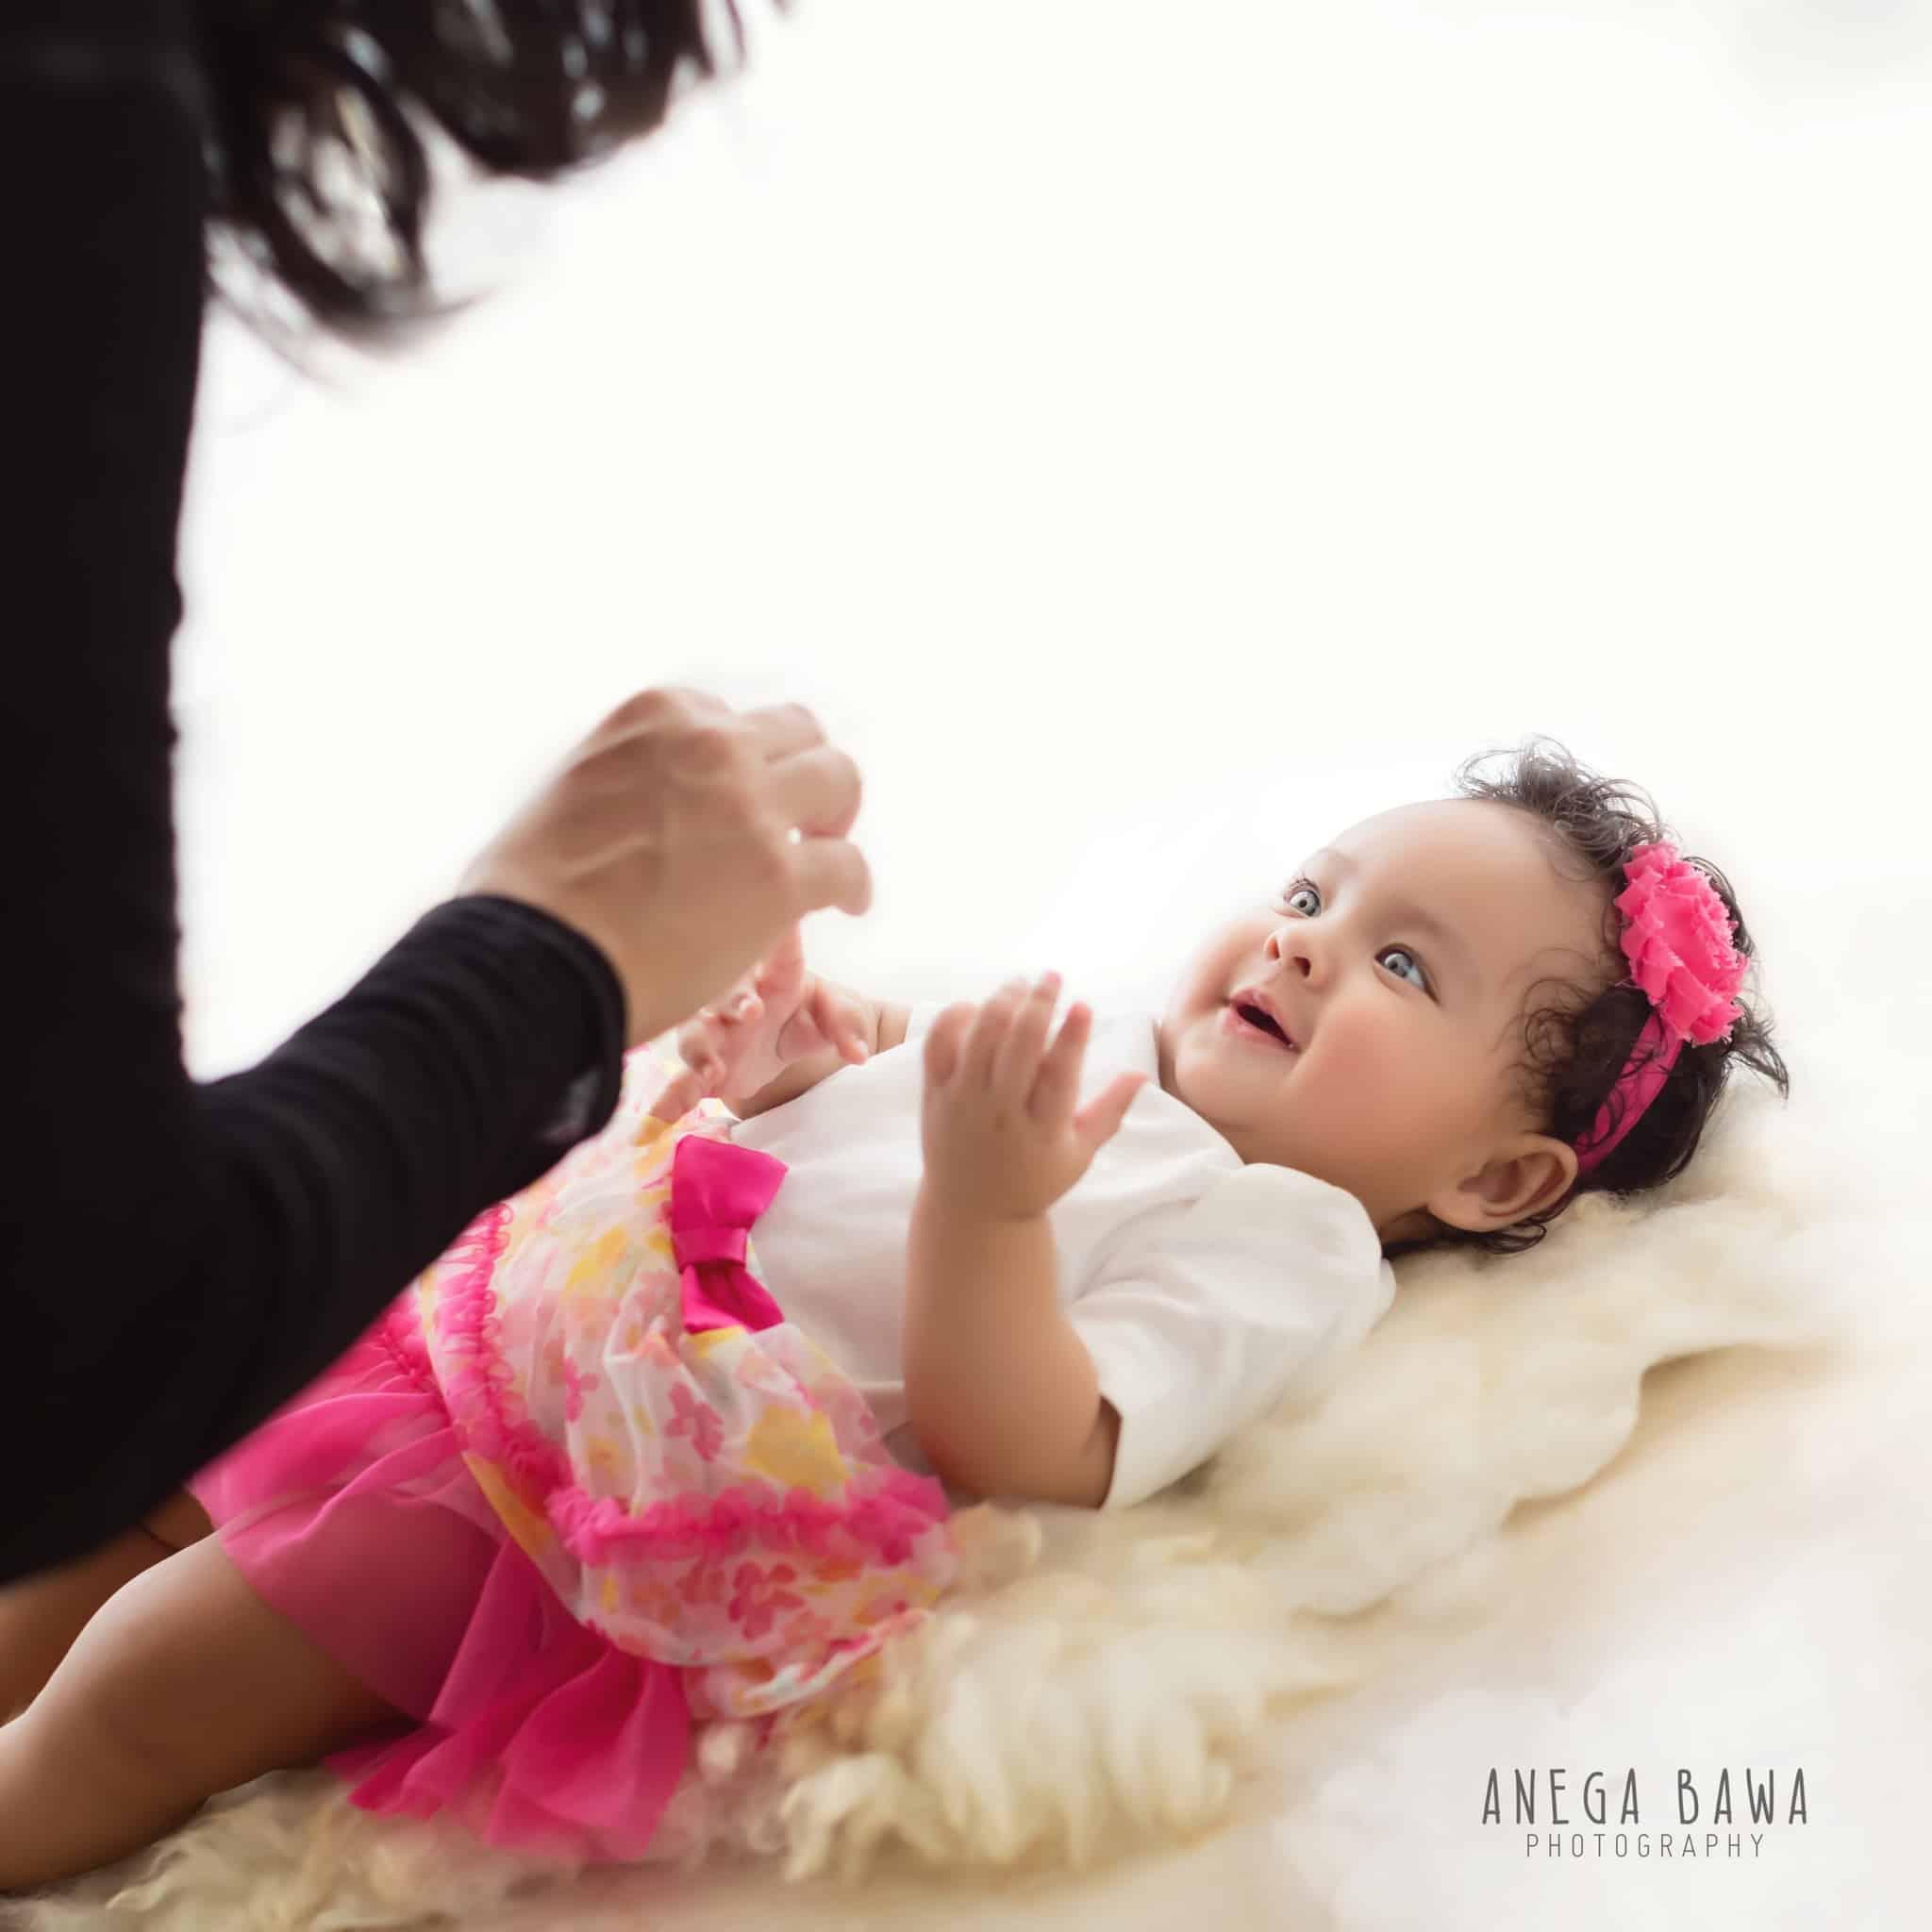 003_baby_photography_delhi_gurgaon_noida_anega_bawa_photography